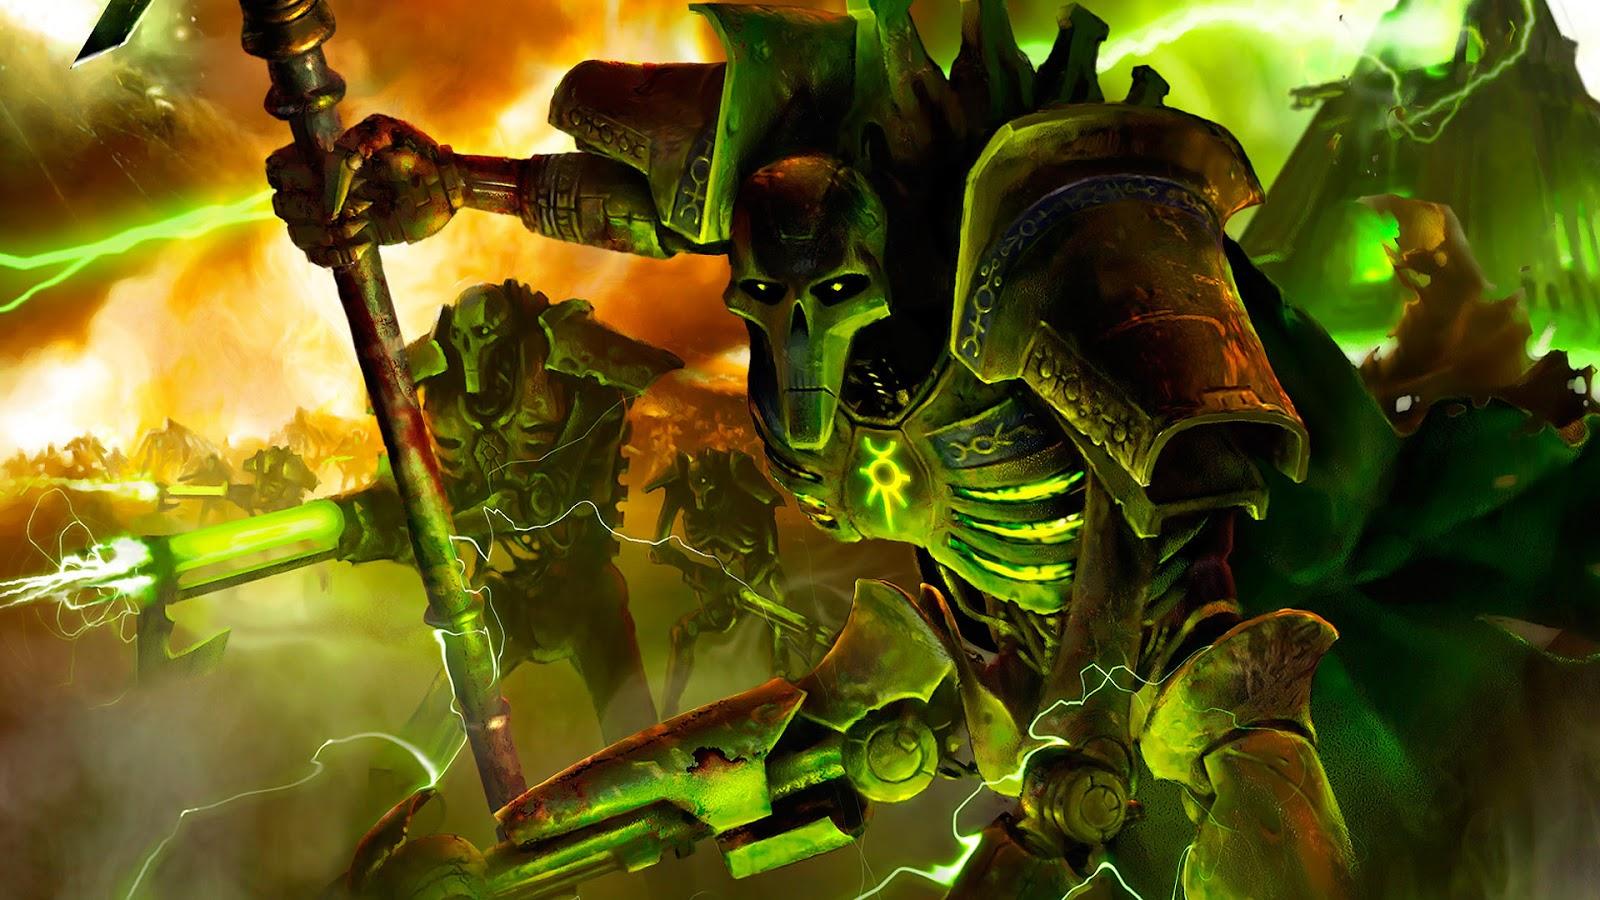 Warhammer 40k Wallpapers